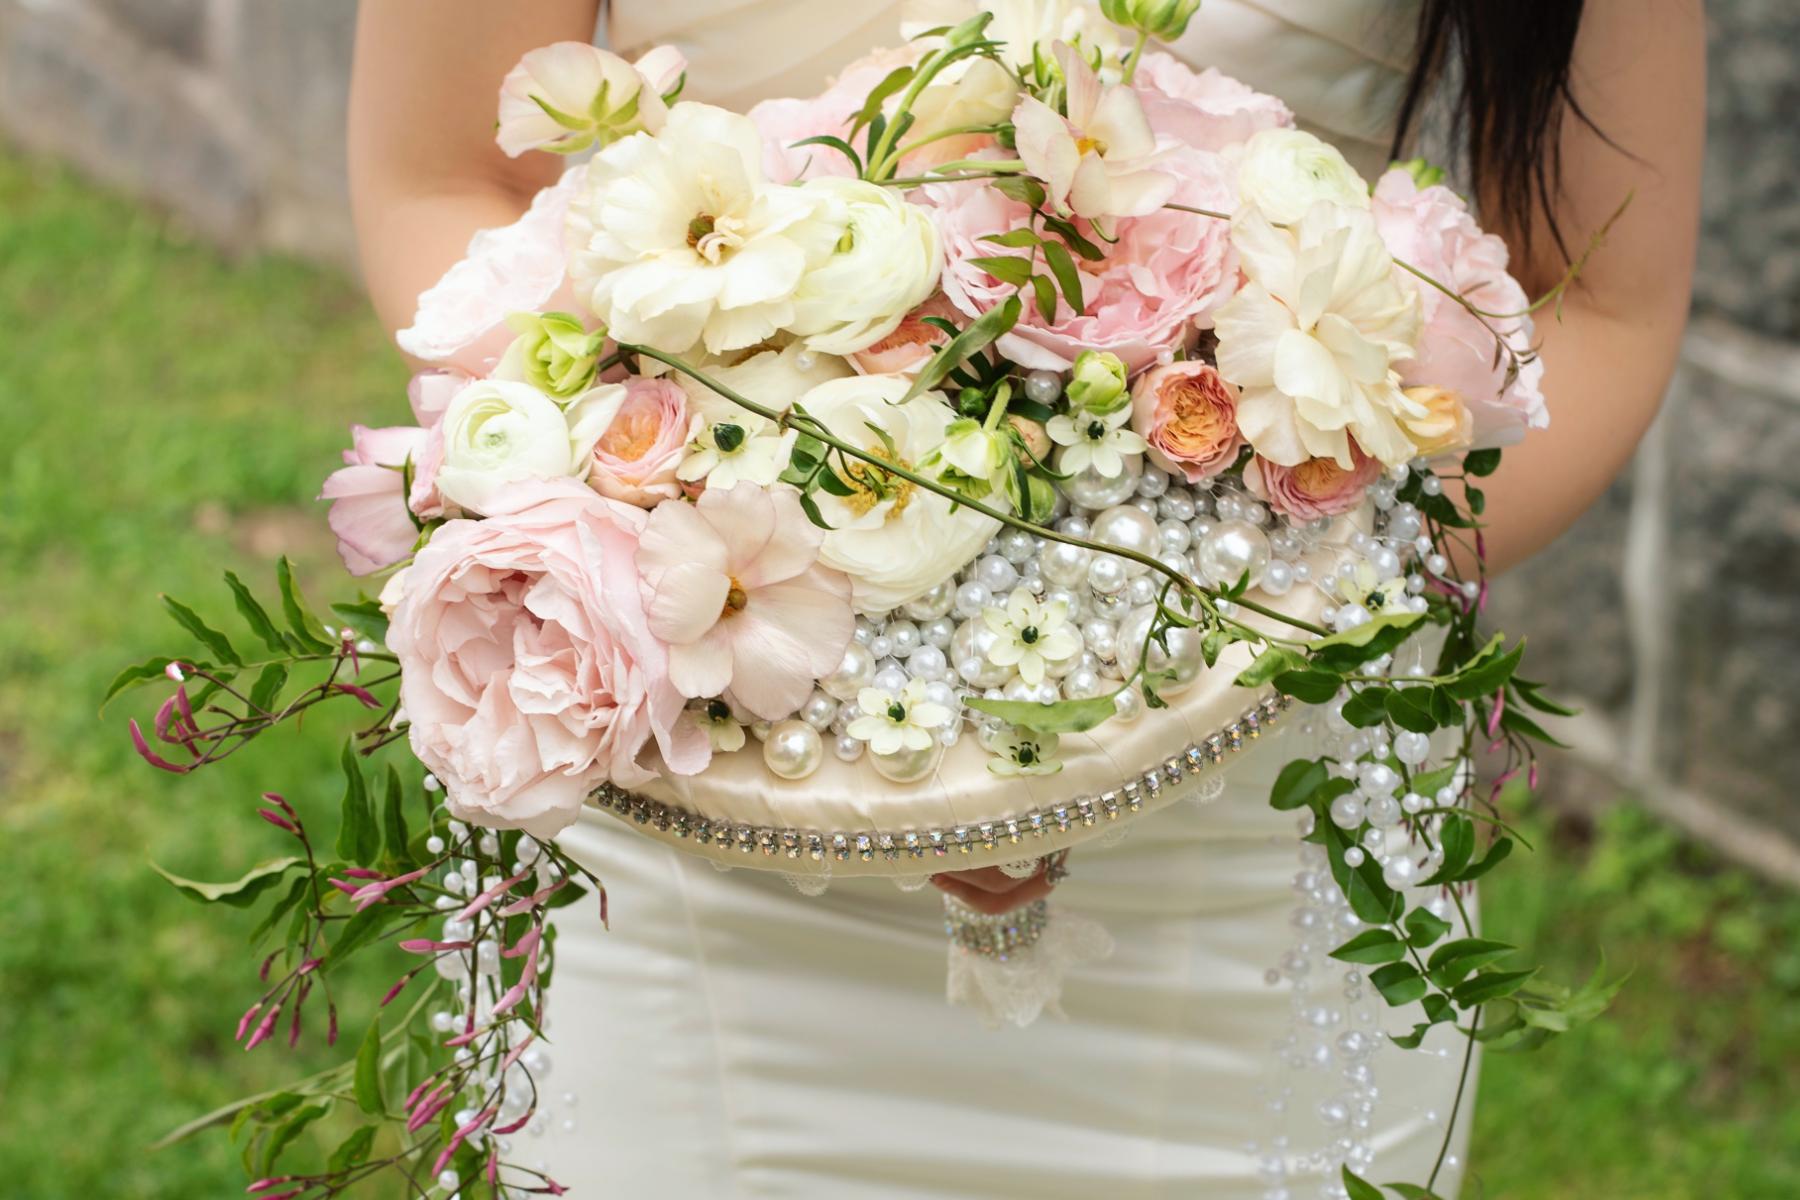 Romantic wedding bouquet in soft pink and blush modern bride designed by Viva La Flora Designs Anahit Hakobyan wedding florist Maryland Washington DC Virginia